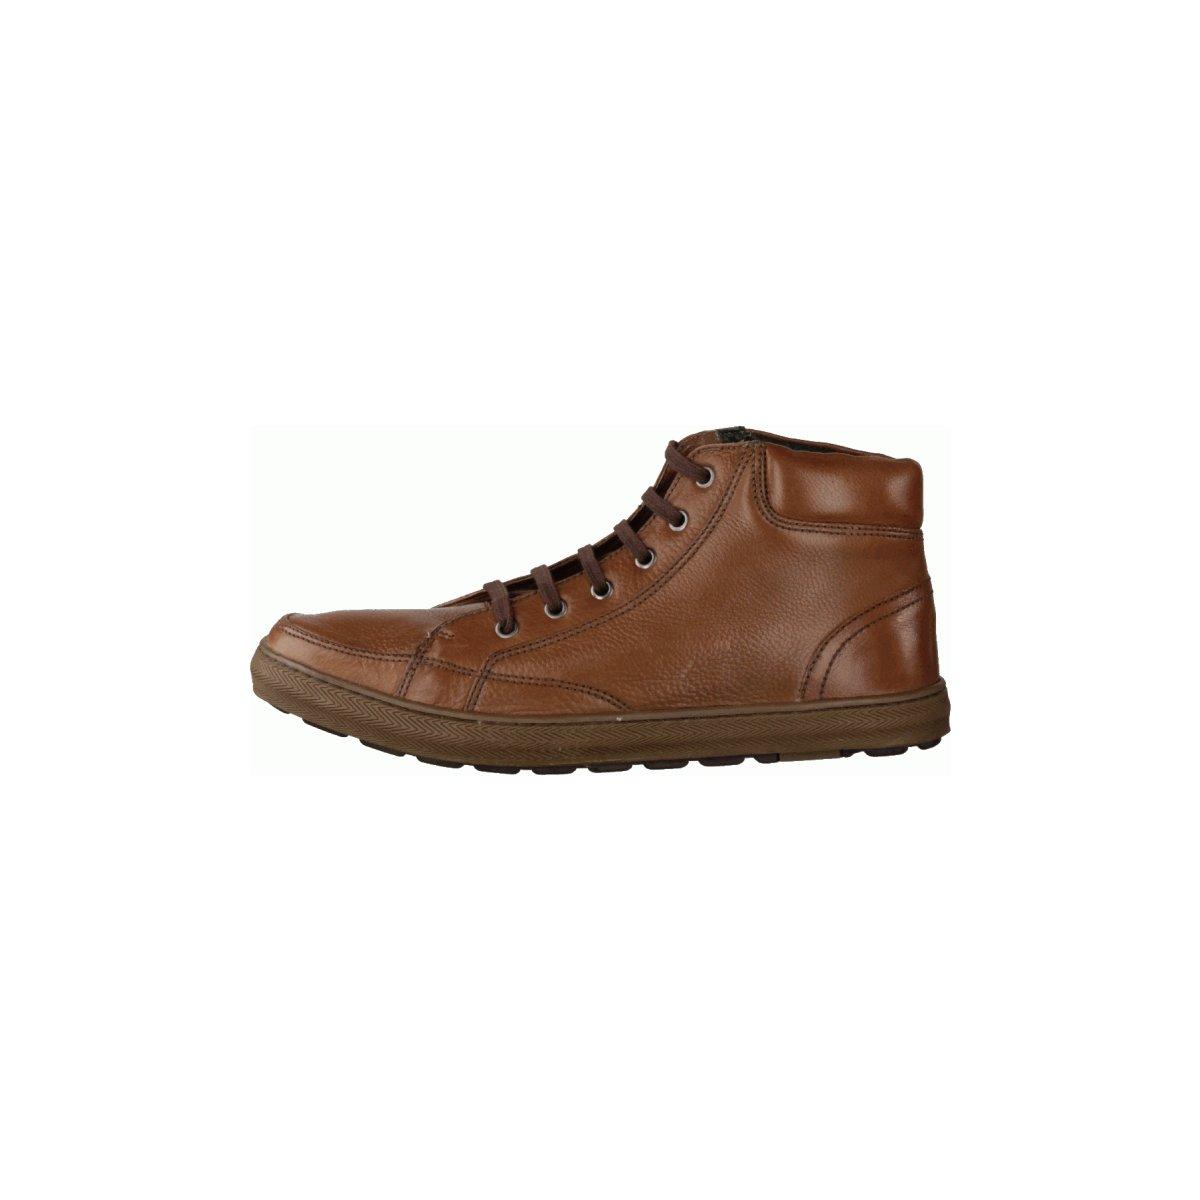 NEU Anatomic & Co Herren Sneaker Santos 272788 braun 221359